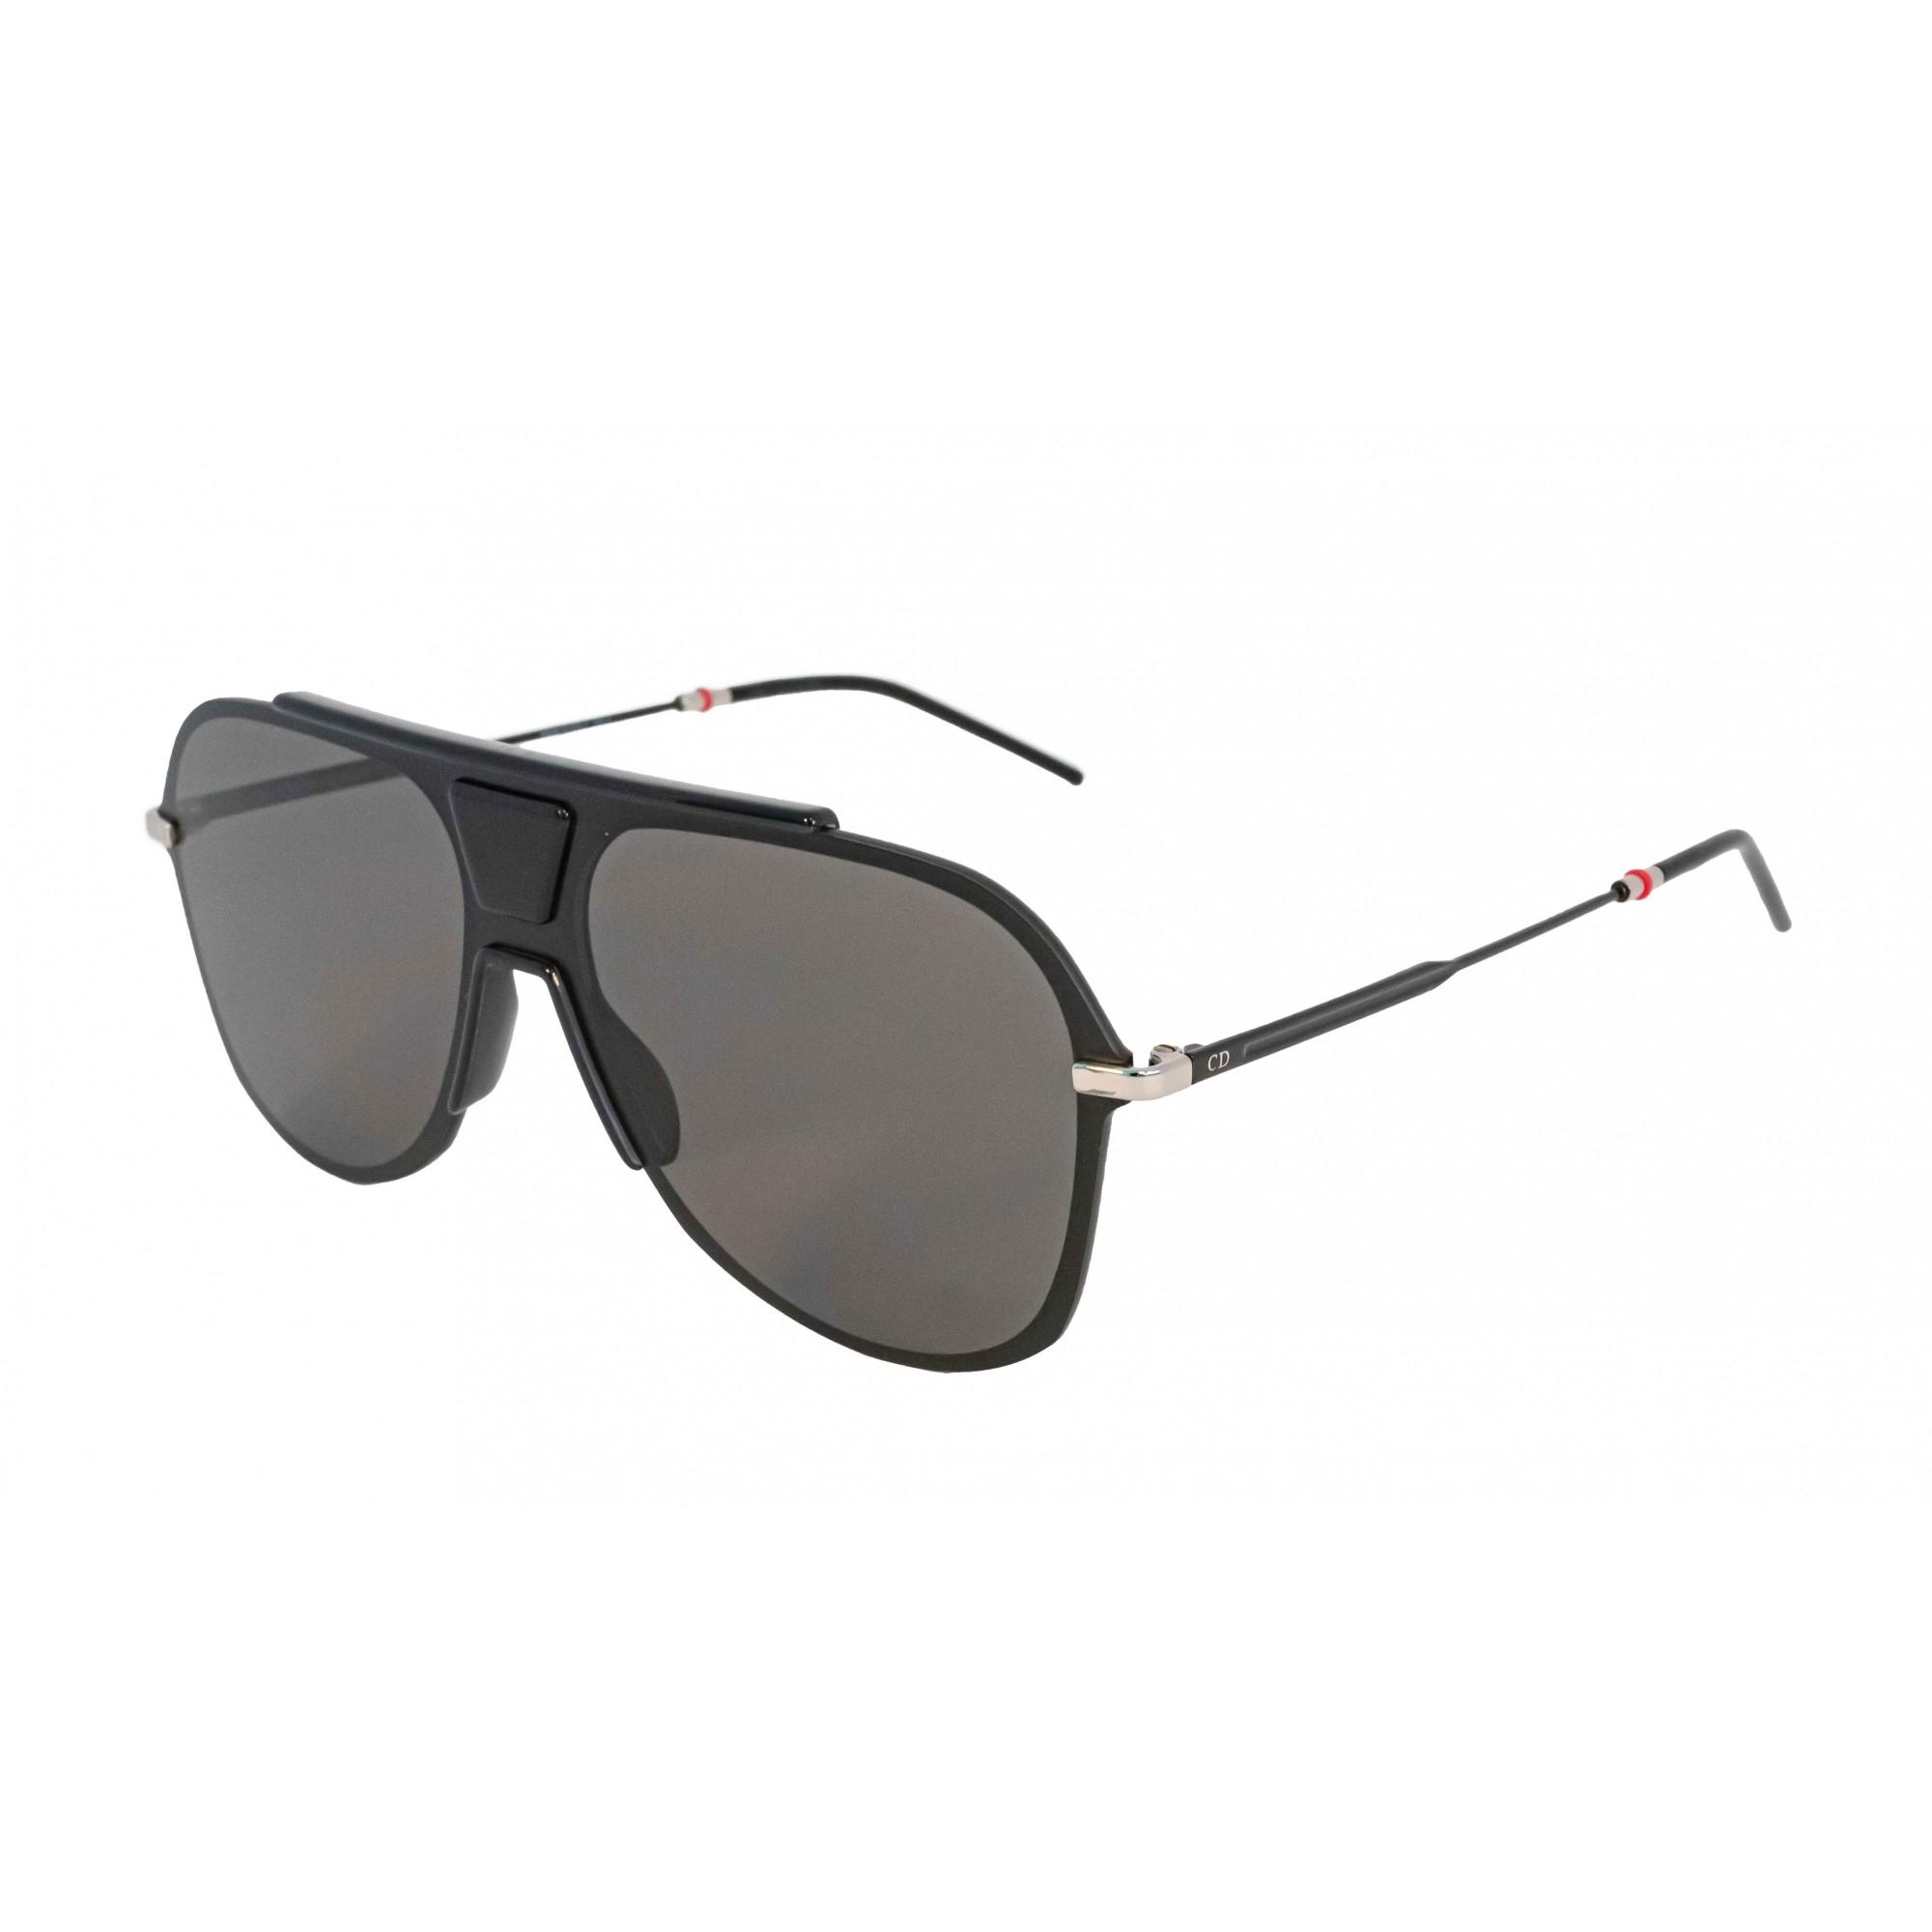 Óculos Dior Homme 0224x O6w2k TU Preto